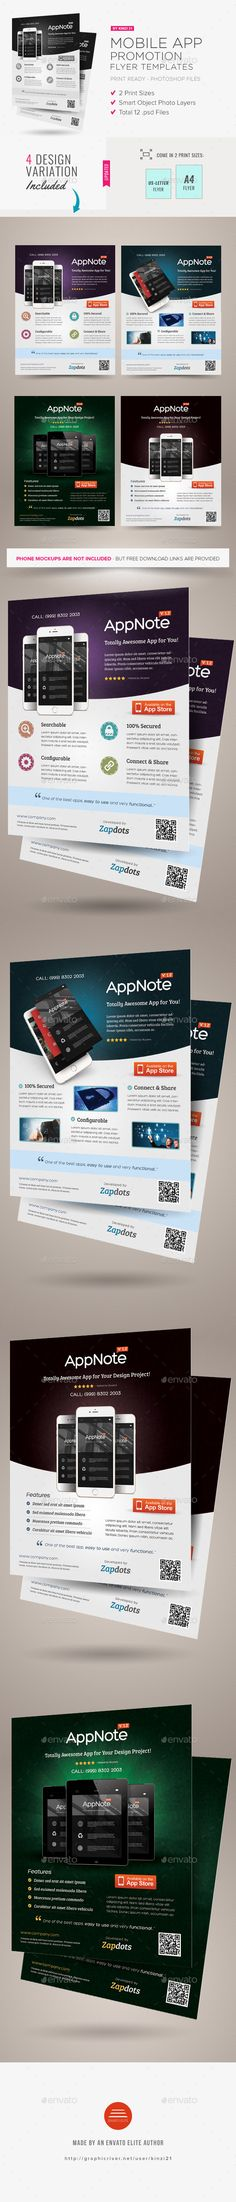 Mobile App Promotion Flyers - Commerce Flyers